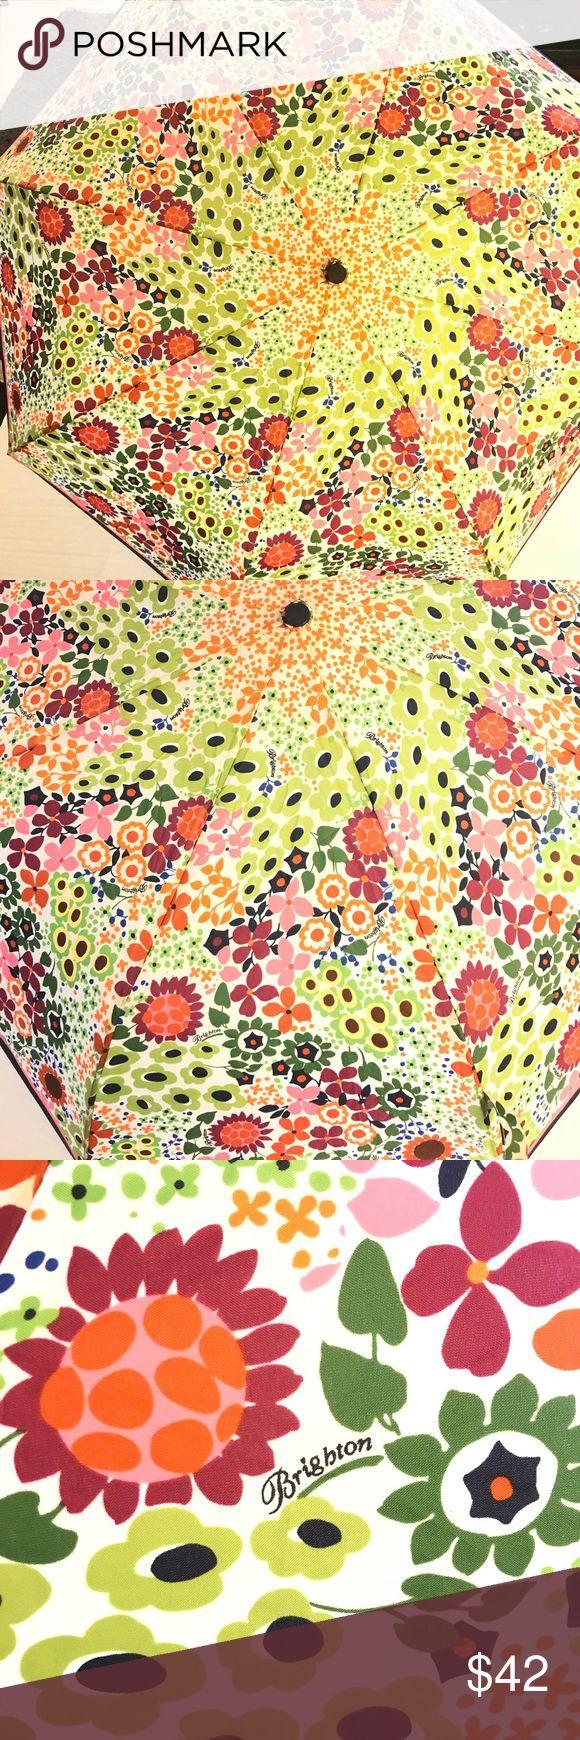 "Brighton floral umbrella Preloved floral Brighton umbrella ☂. Opens automatically and closes manually.  Black handle with wrist strap.  34"" circumference. Brighton Accessories Umbrellas"